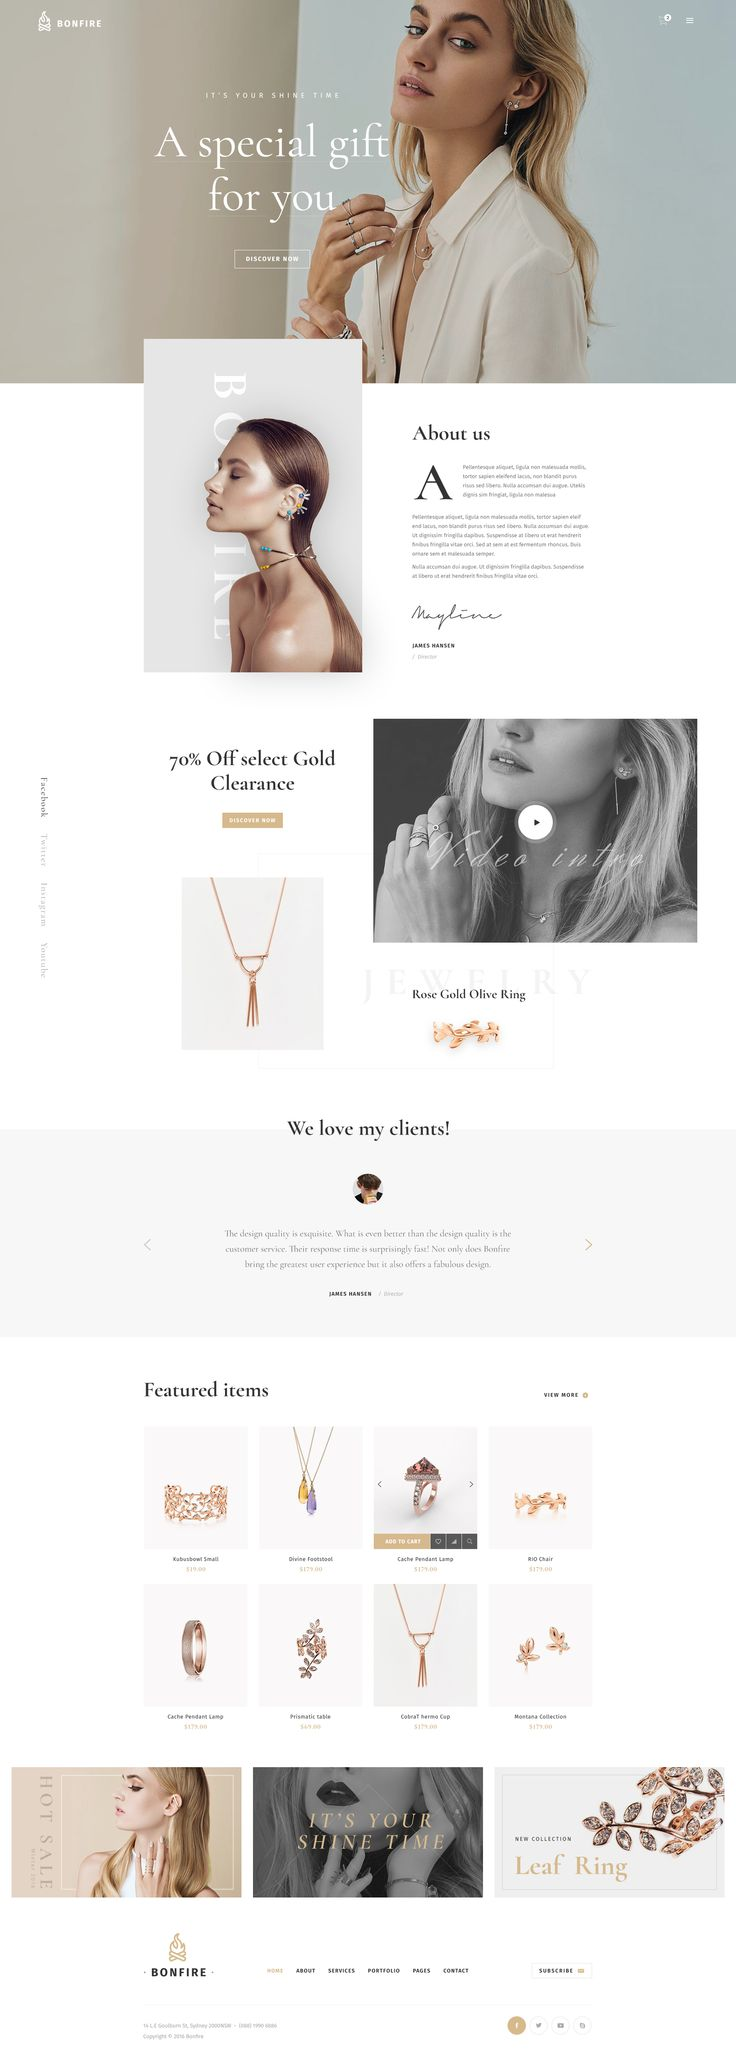 sleek shopping site